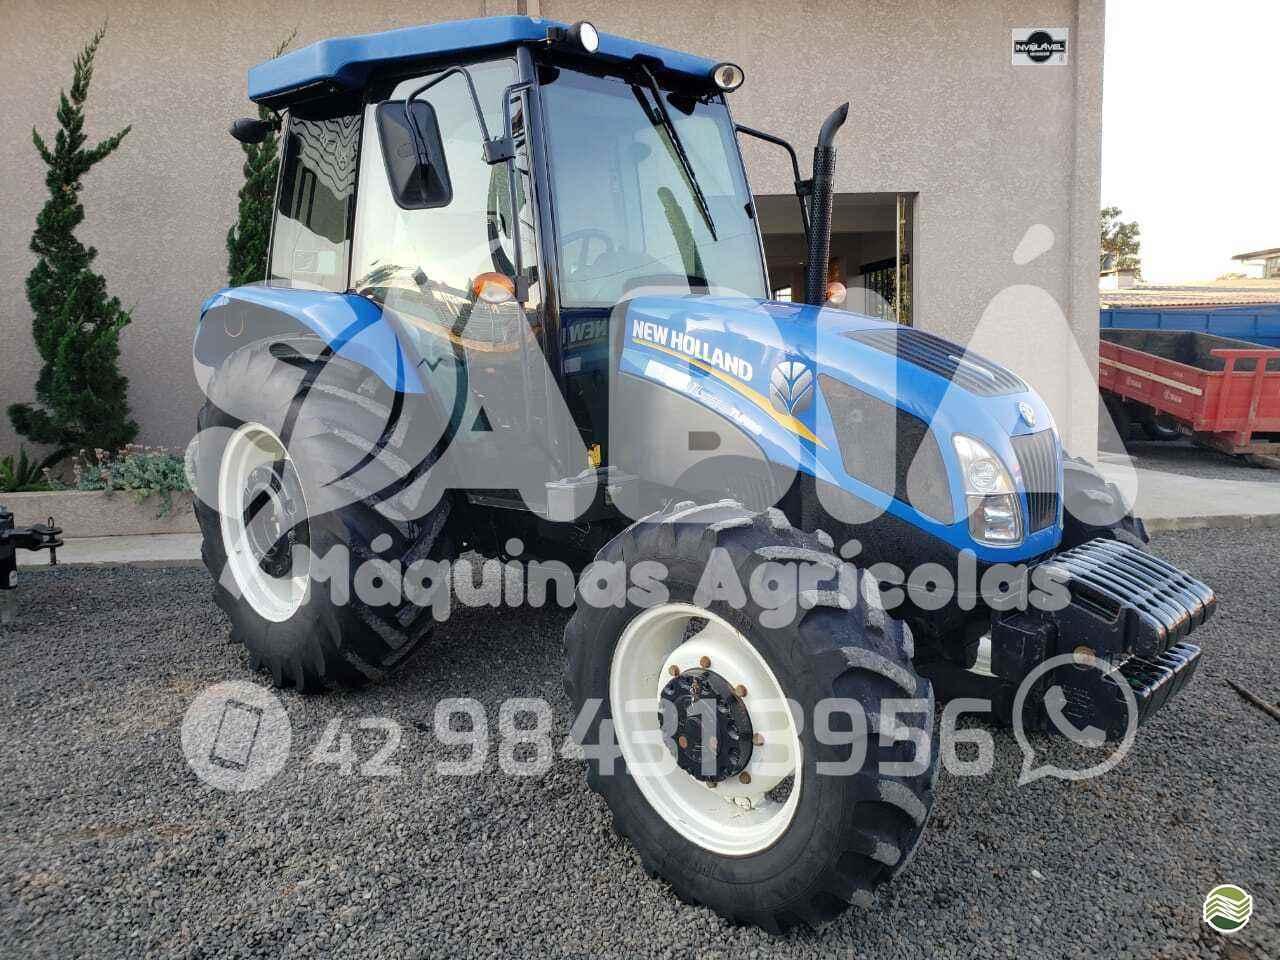 TRATOR NEW HOLLAND NEW TL 75 Tração 4x4 Sabiá Máquinas Agrícolas - Landini IRATI PARANÁ PR